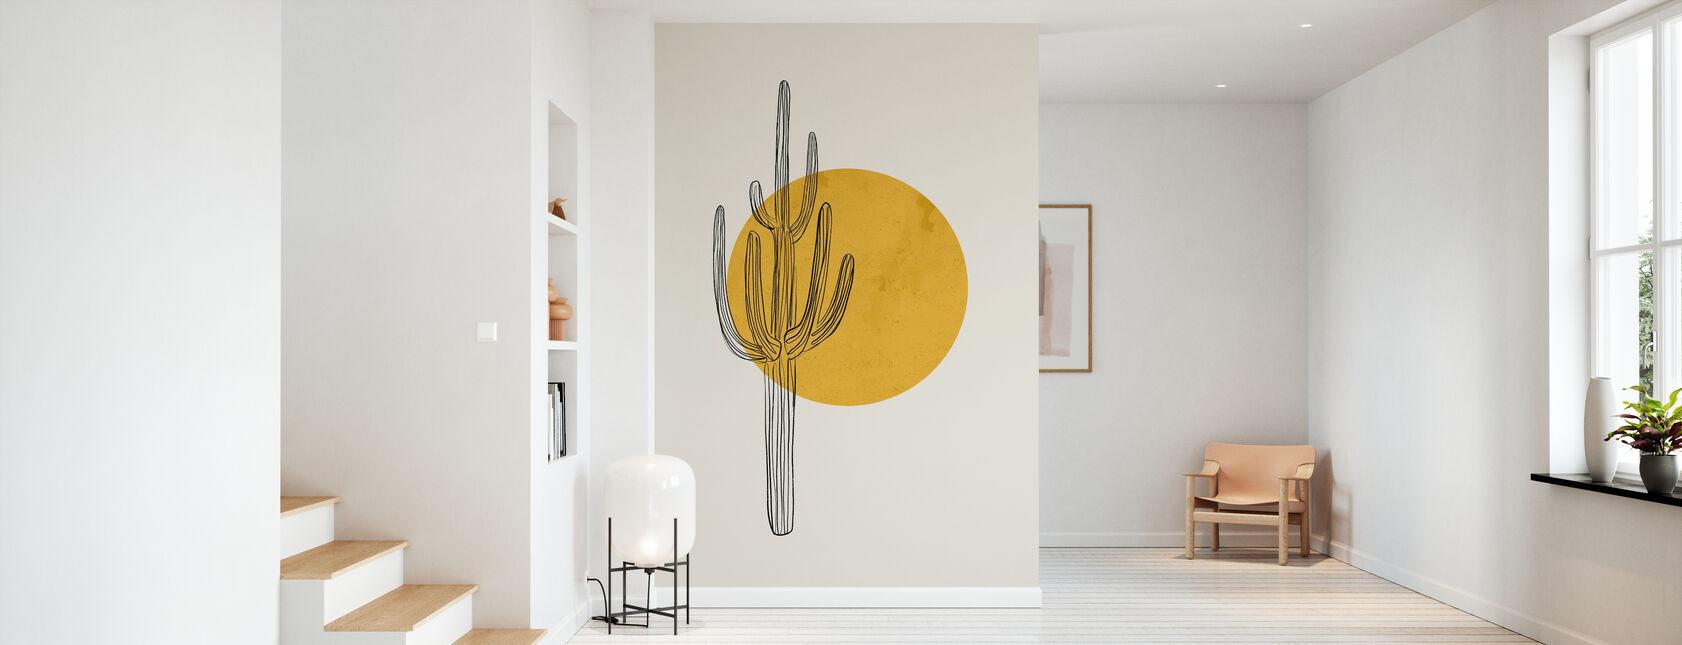 Saguaro - Wallpaper - Hallway